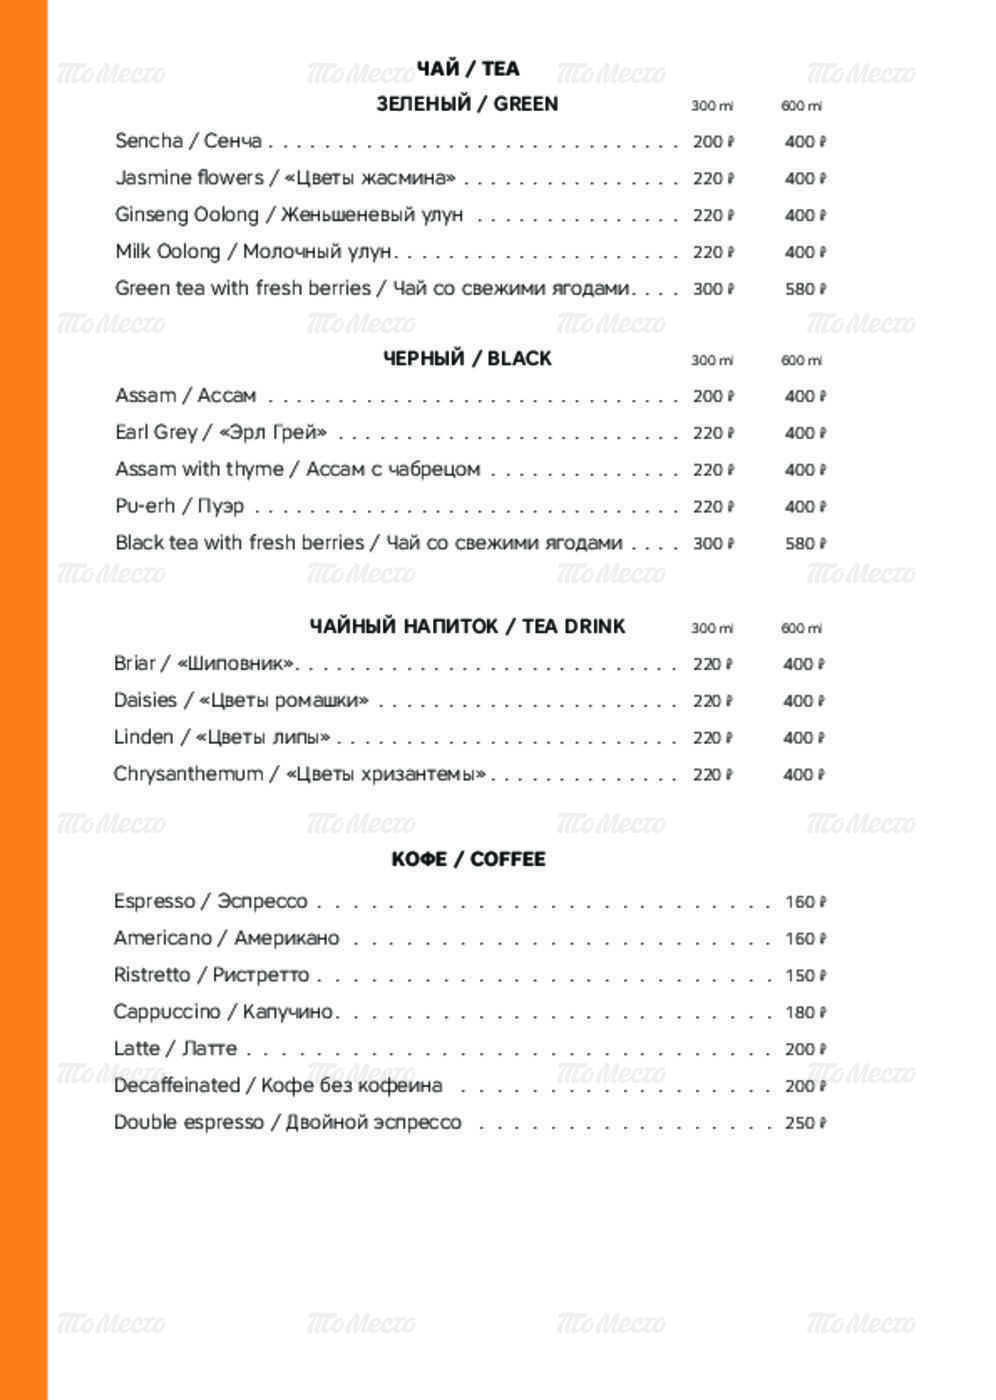 Меню ресторана Плюшкин на Комендантском проспекте фото 34